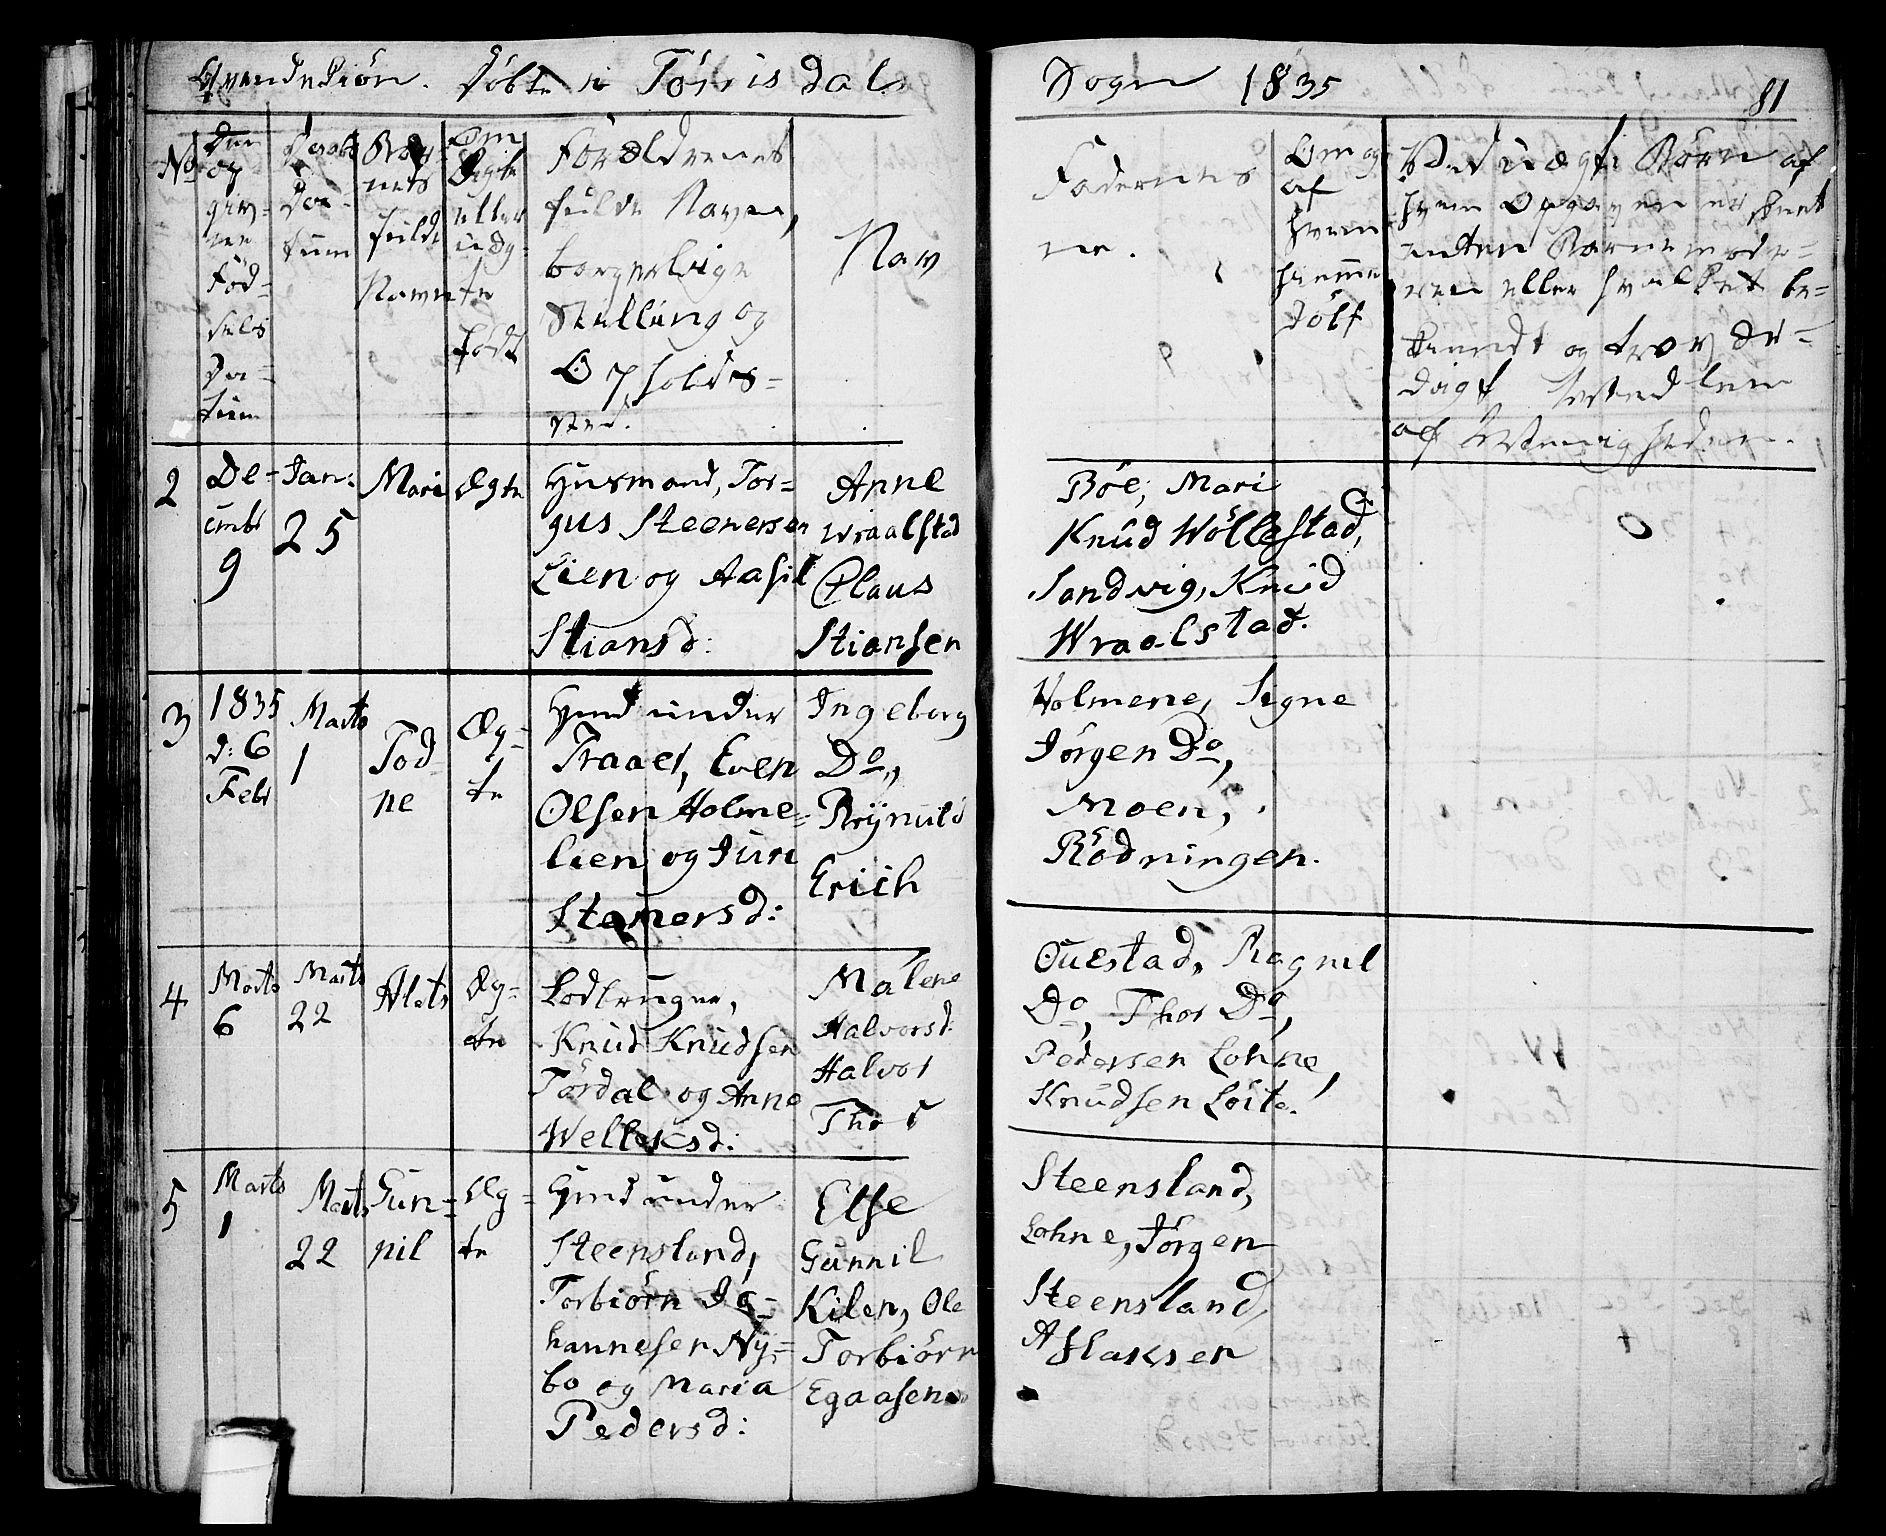 SAKO, Drangedal kirkebøker, F/Fa/L0006: Ministerialbok nr. 6, 1831-1837, s. 81